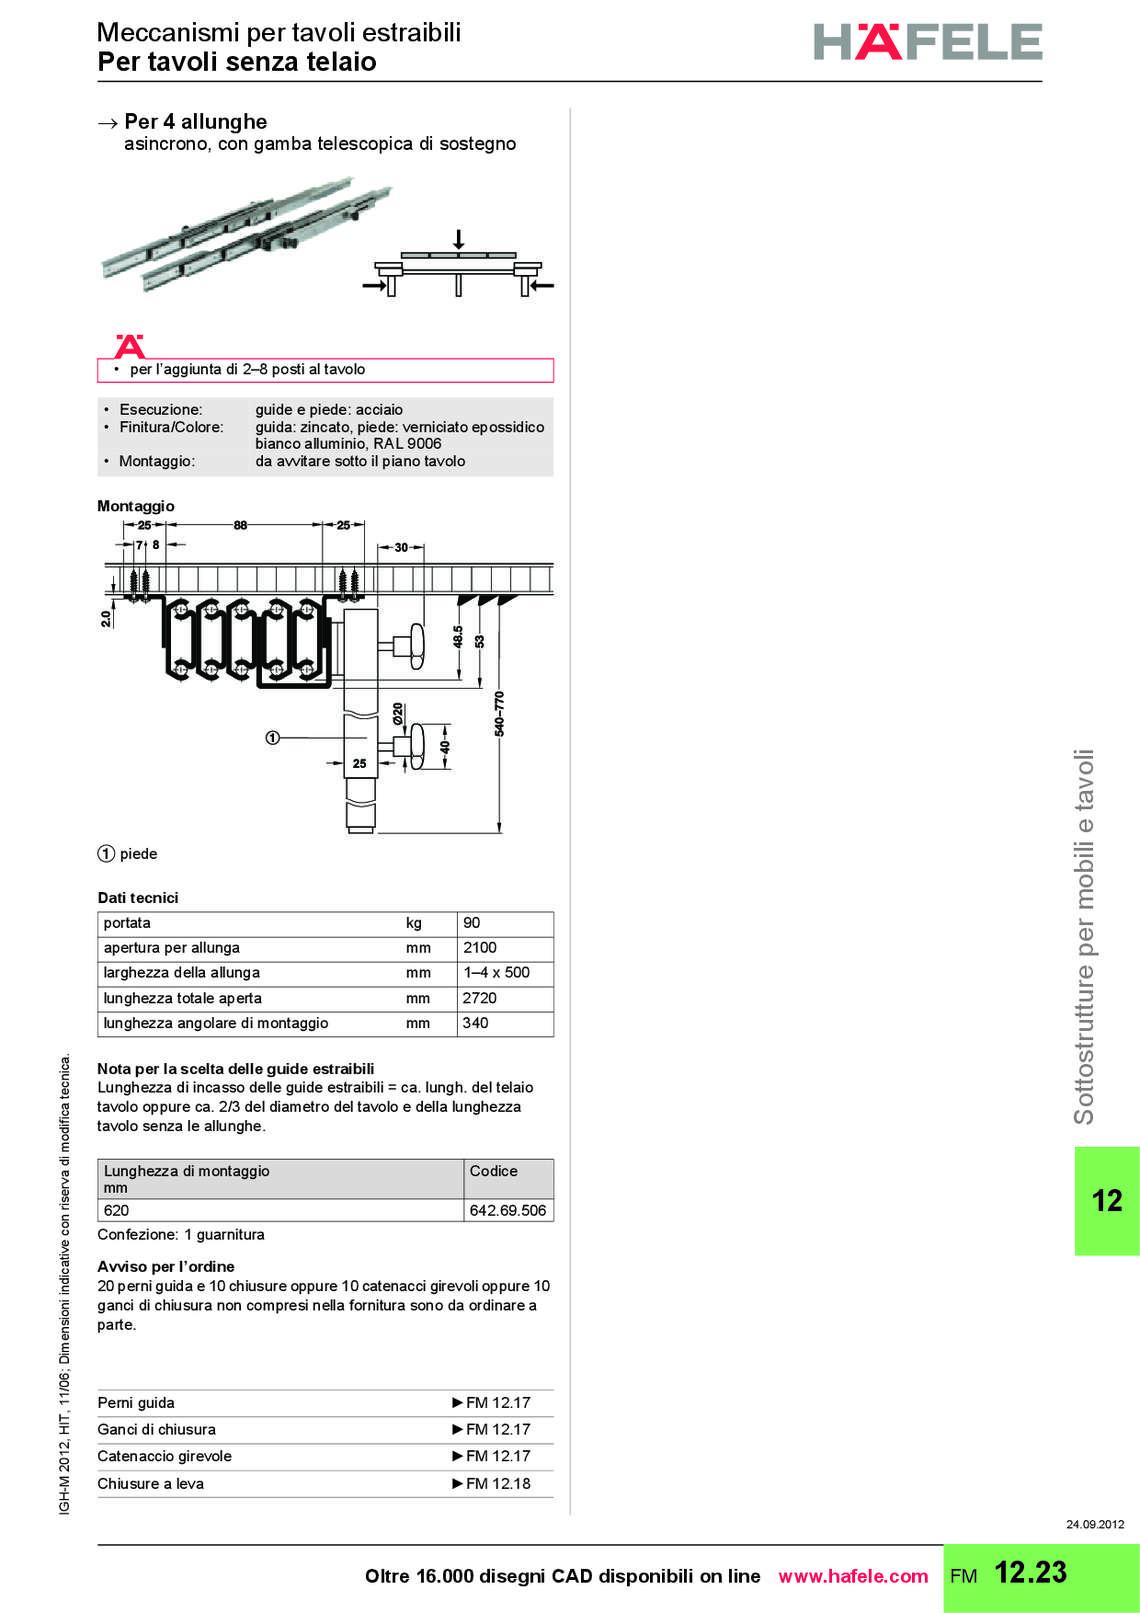 hafele-sottostrutture-per-mobili_83_038.jpg